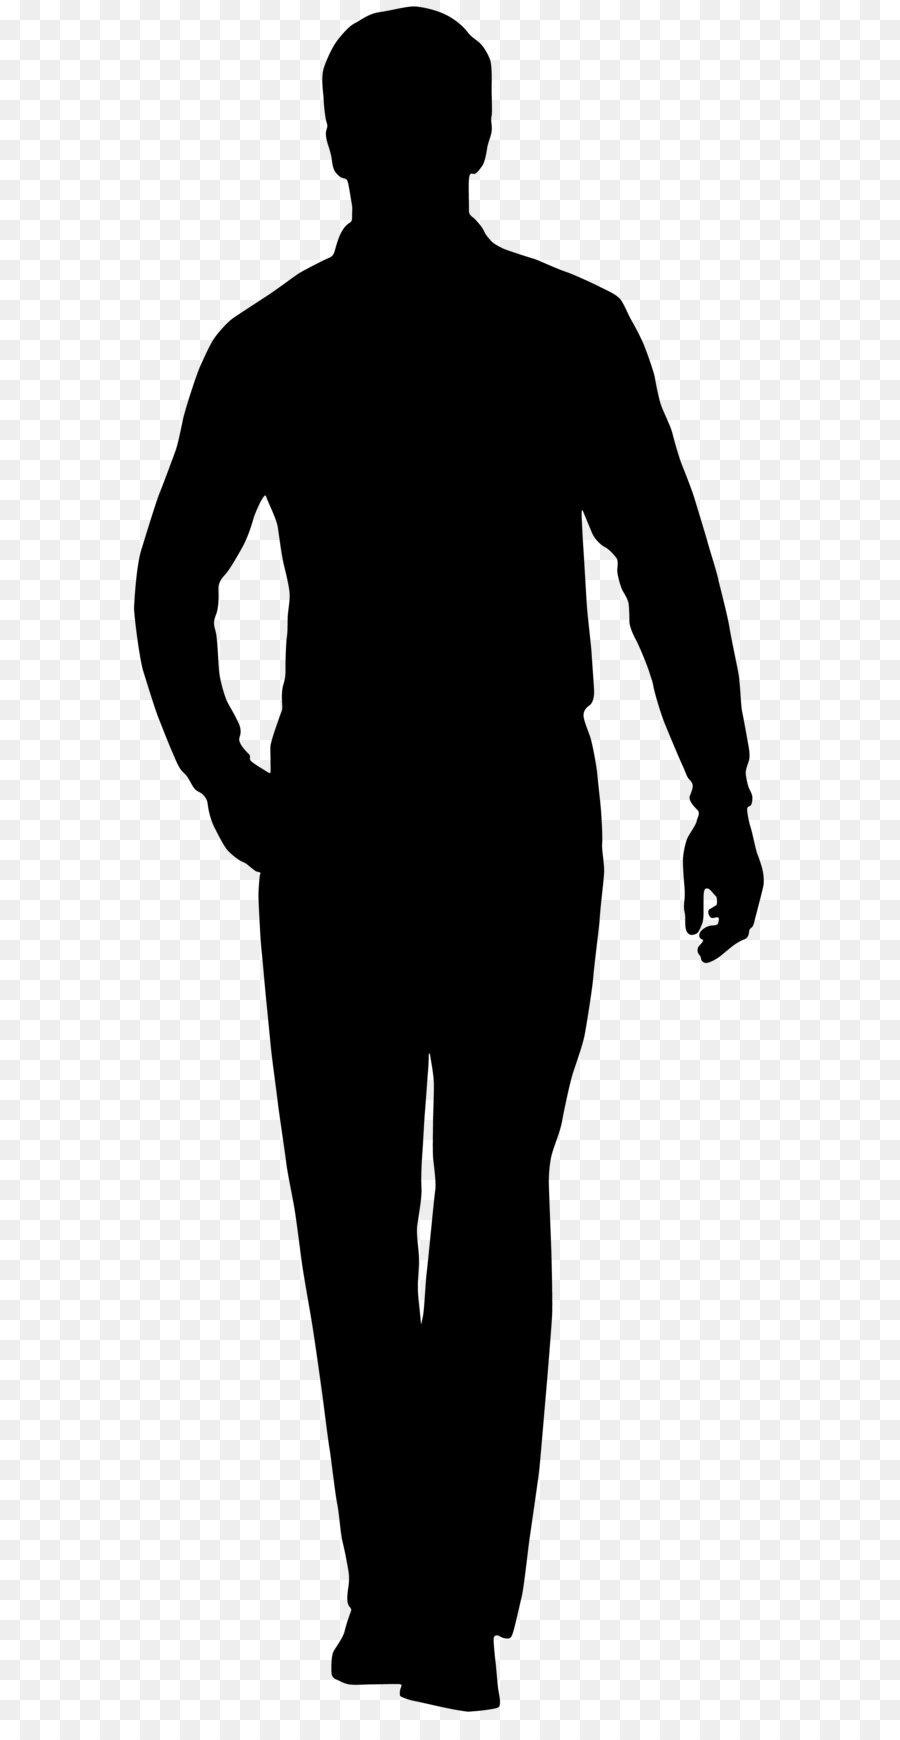 Free Human Silhouette Clip Art, Download Free Clip Art, Free Clip.